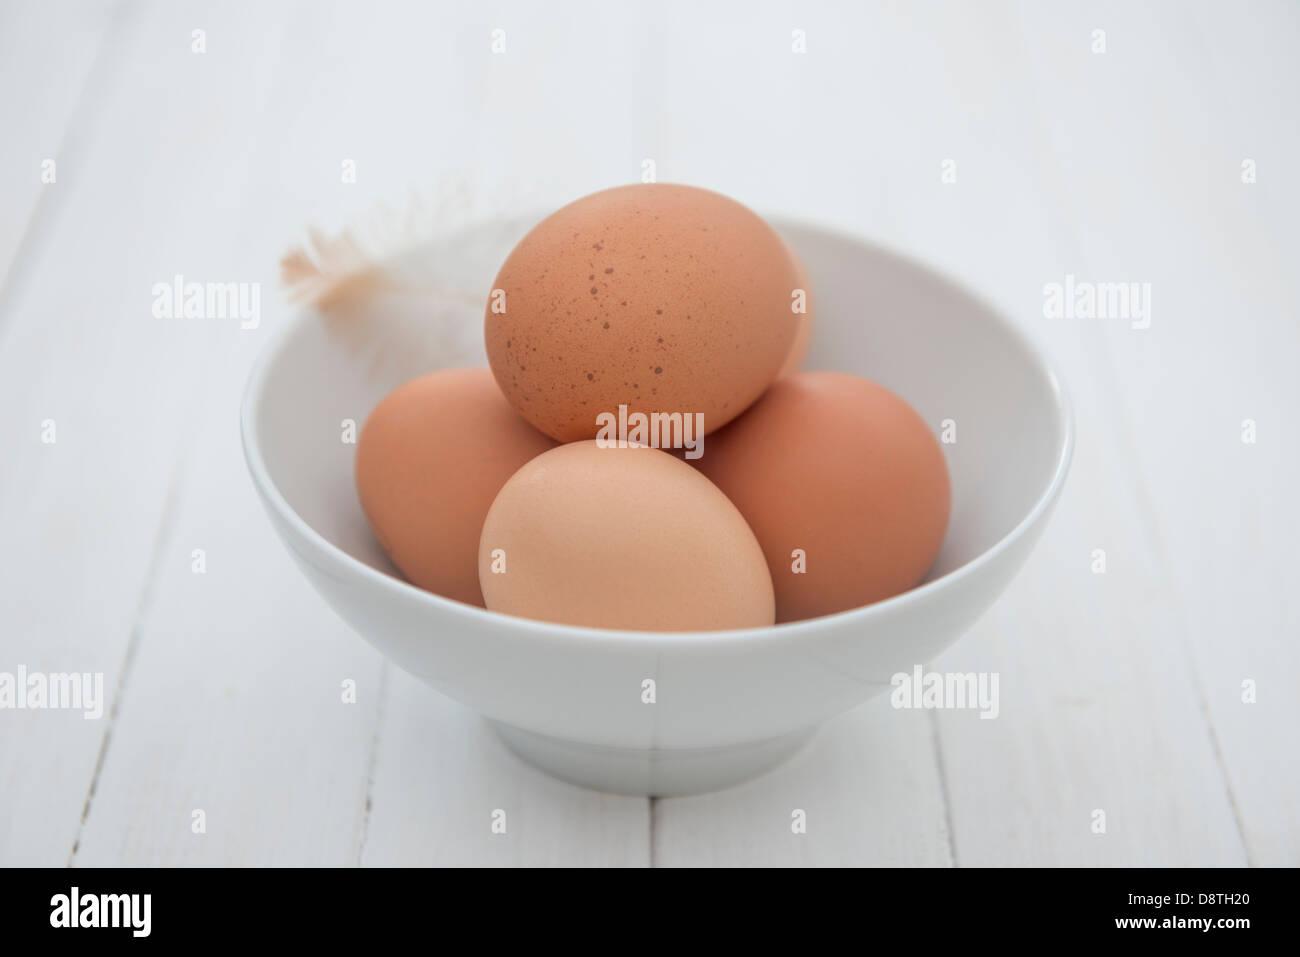 Freshly laid organic free range eggs in a bowl. - Stock Image